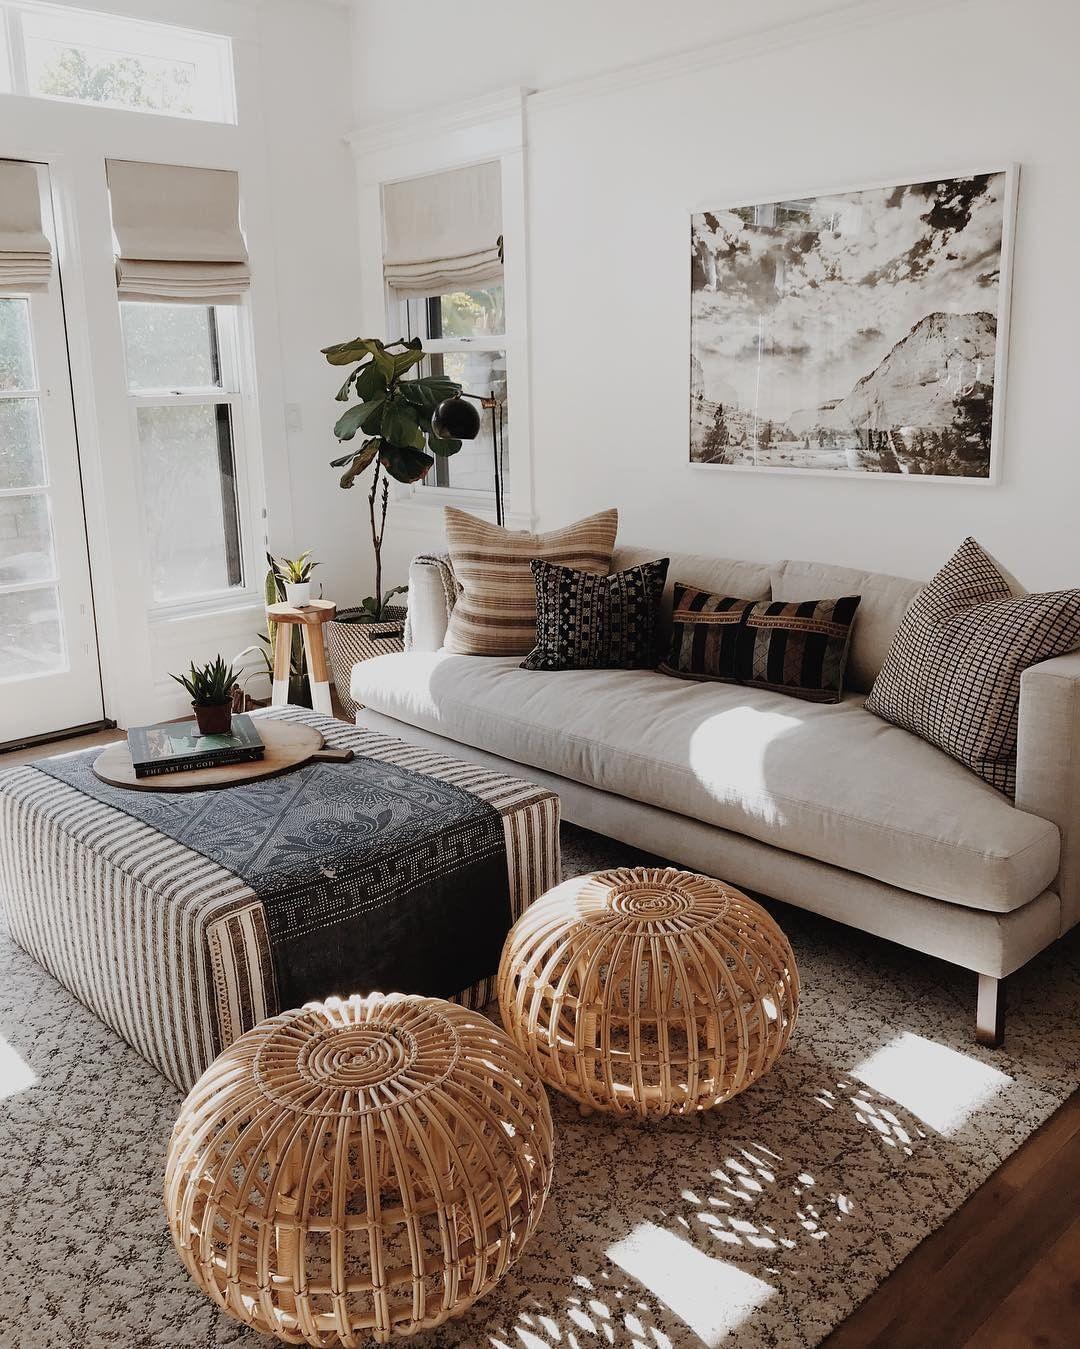 721140 21 1385 En Us Neutral Living Room Interior Design Living